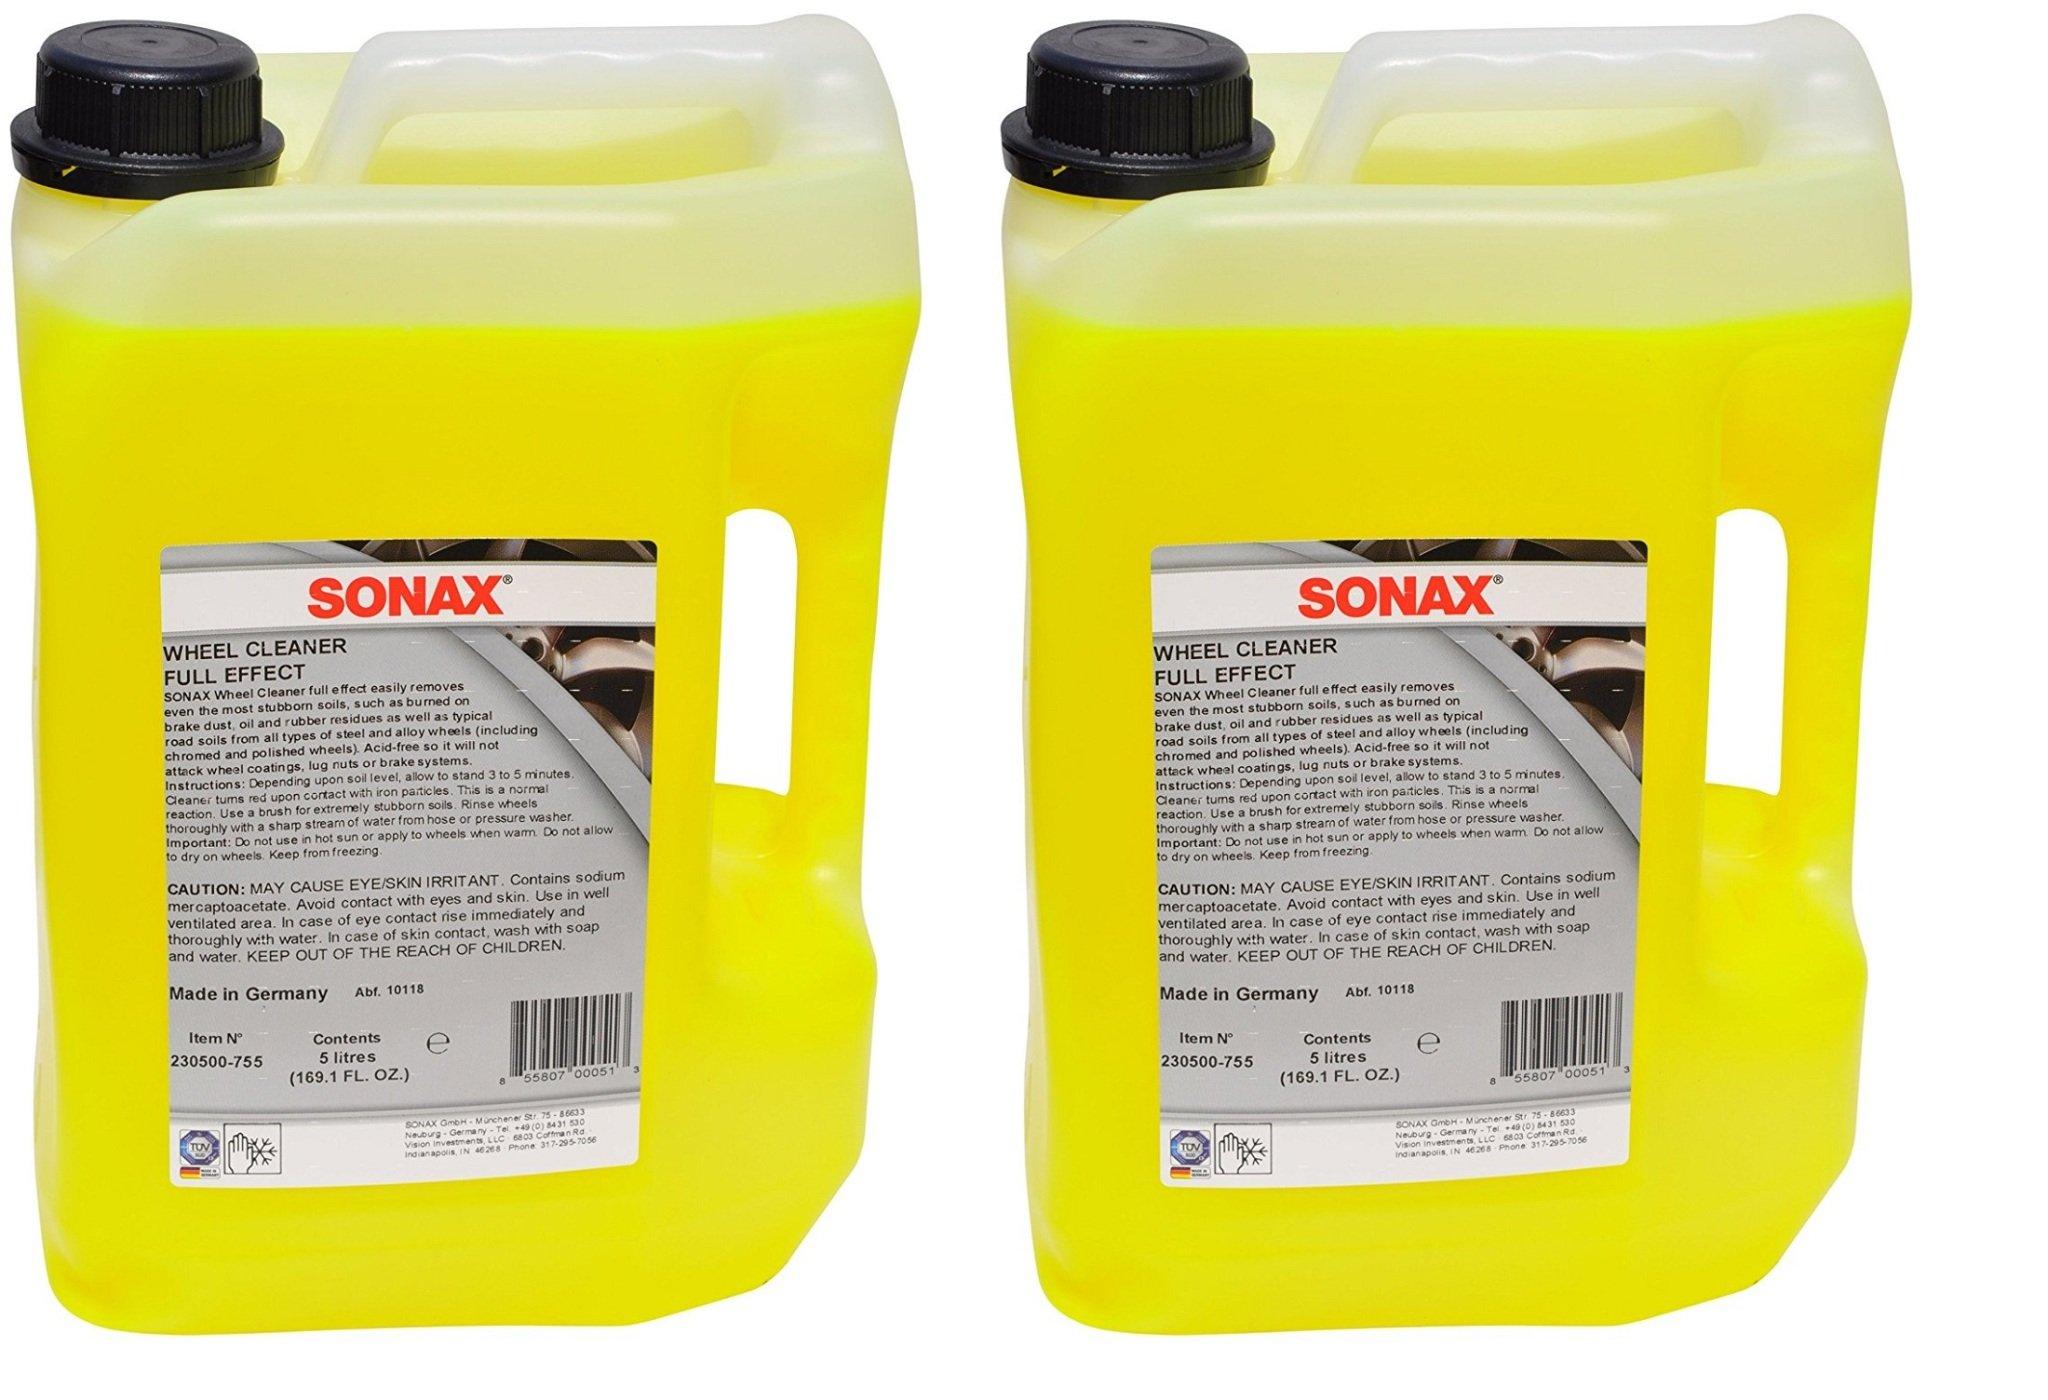 Sonax Wheel Cleaner FullEffect, DeYJIv 2 Pack (169.1 fl. oz.)